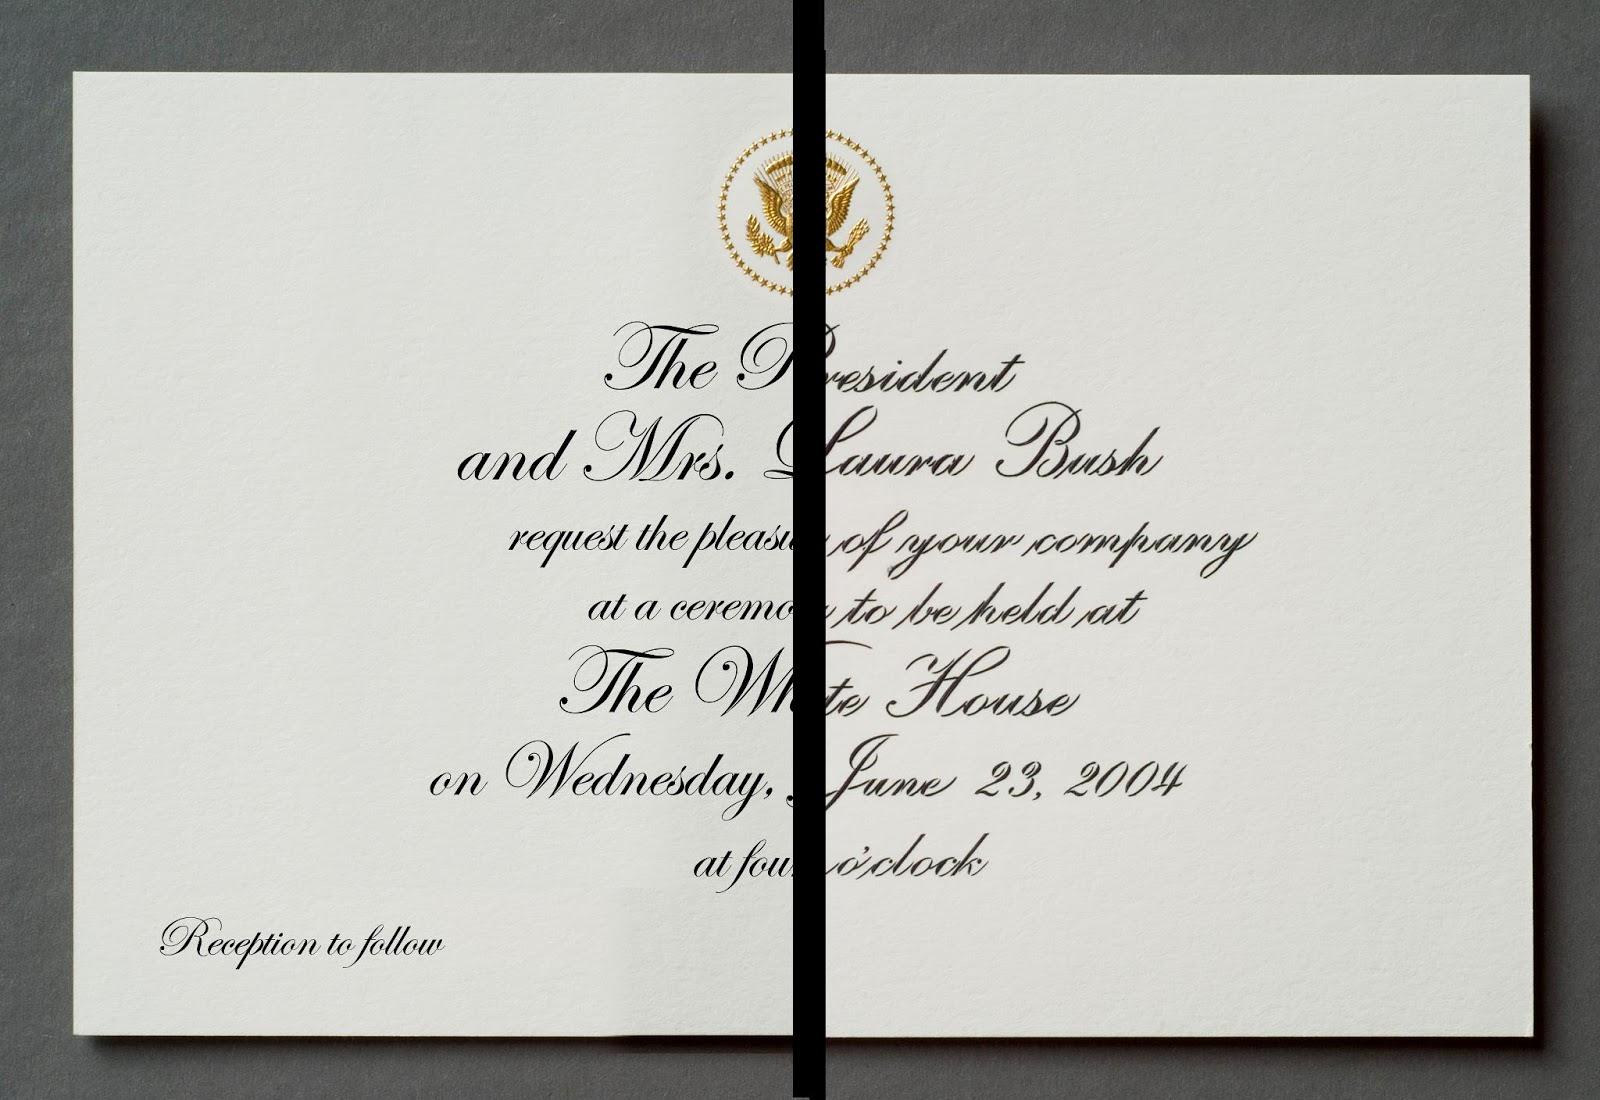 White House Calligraphy Paperwhite Studio